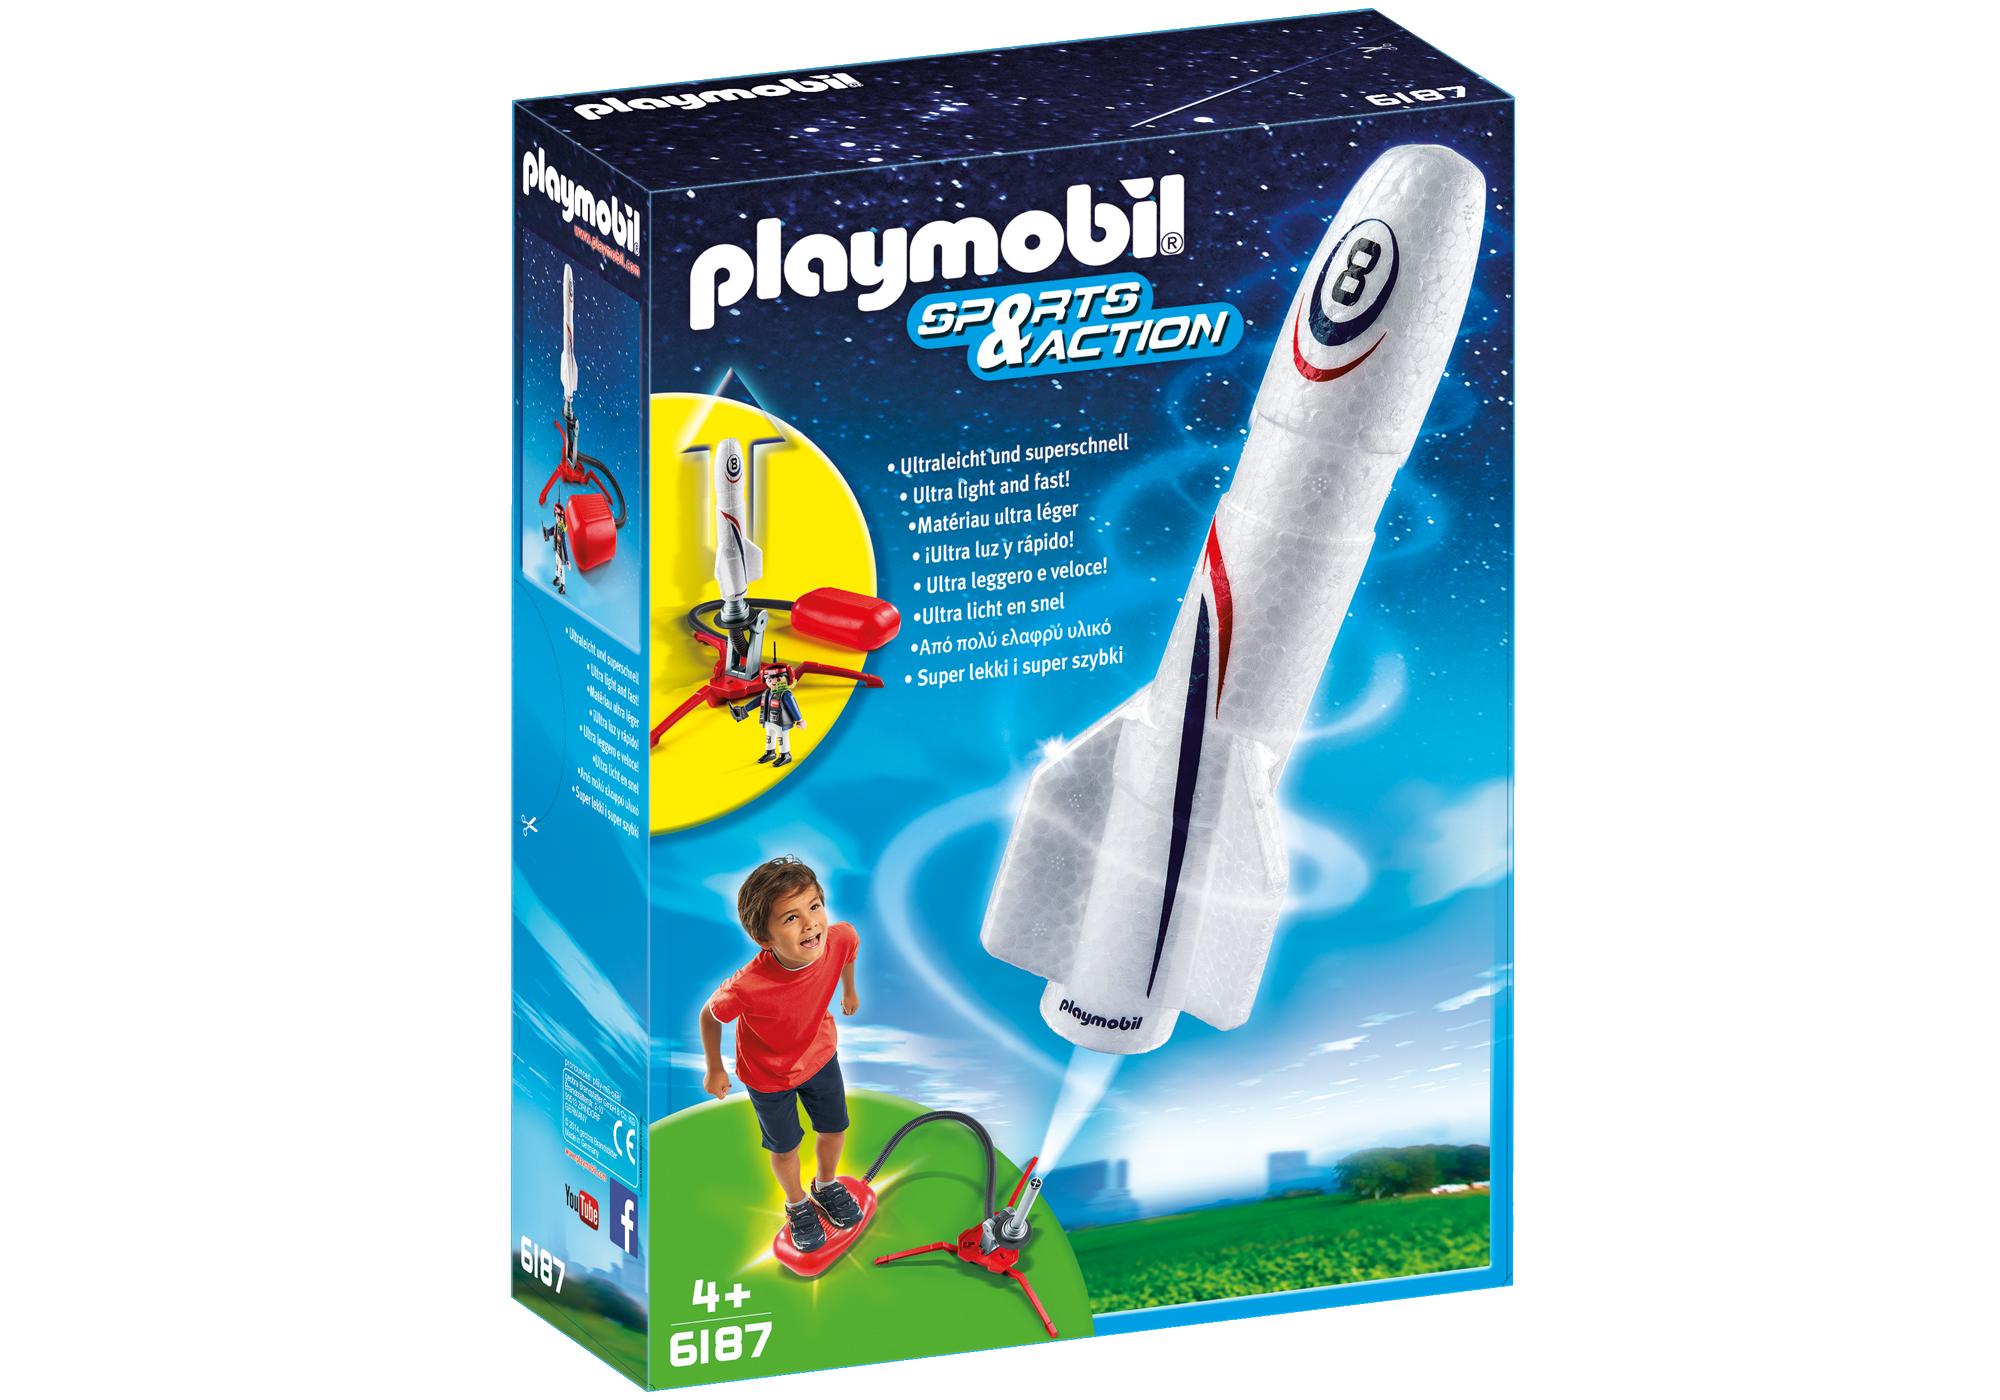 http://media.playmobil.com/i/playmobil/6187_product_box_front